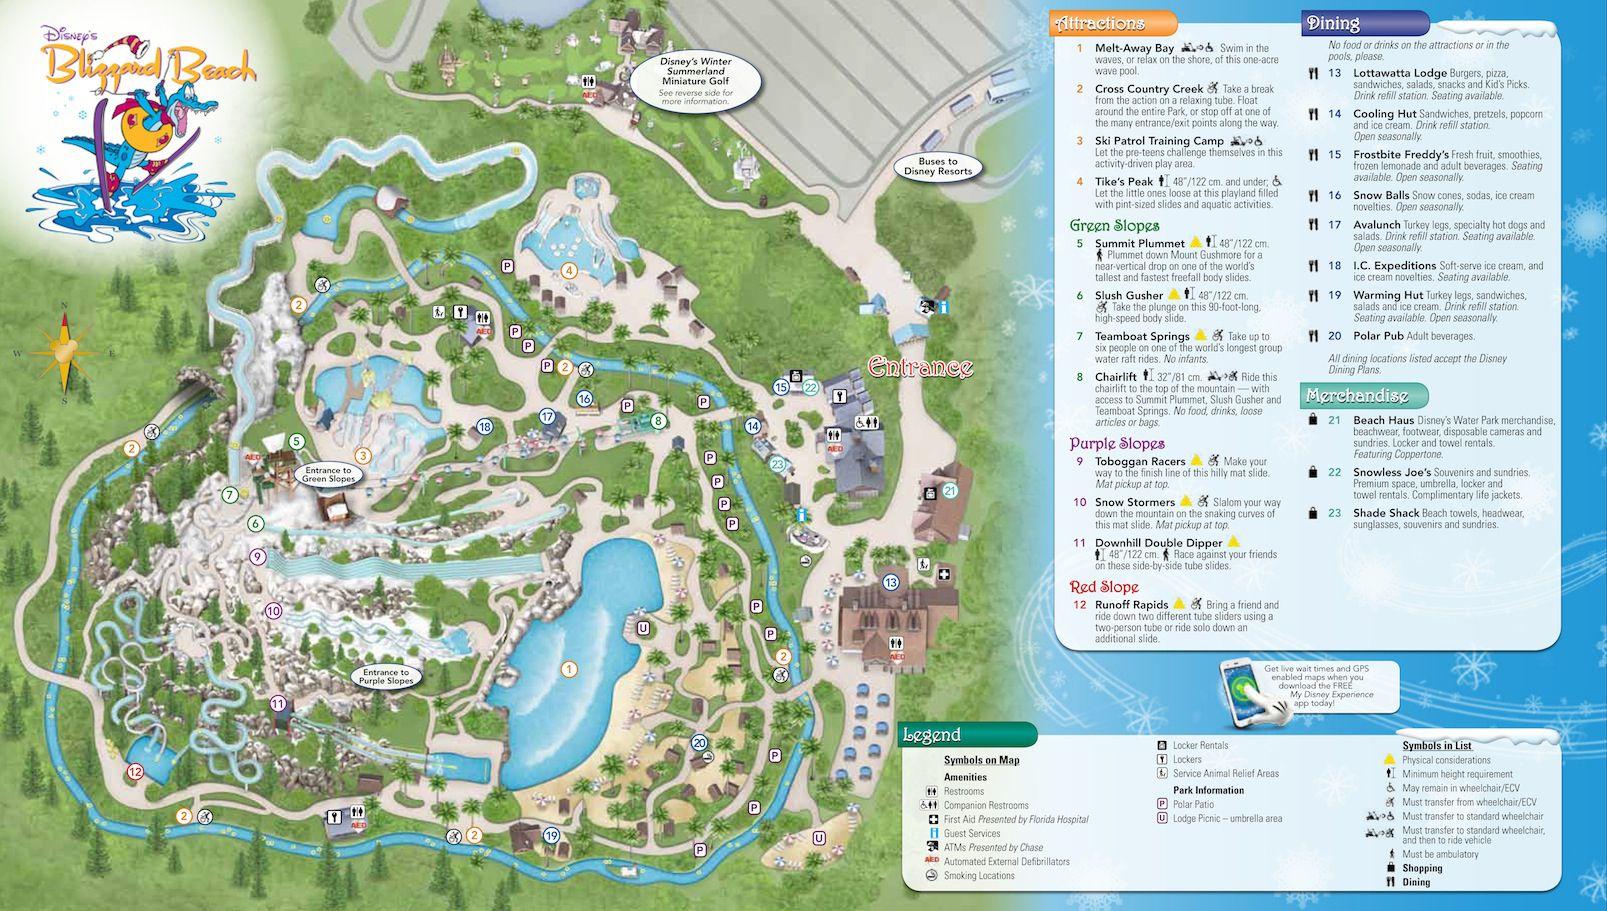 Blizzard Beach Map With Polar Patio Locations Disney World Map